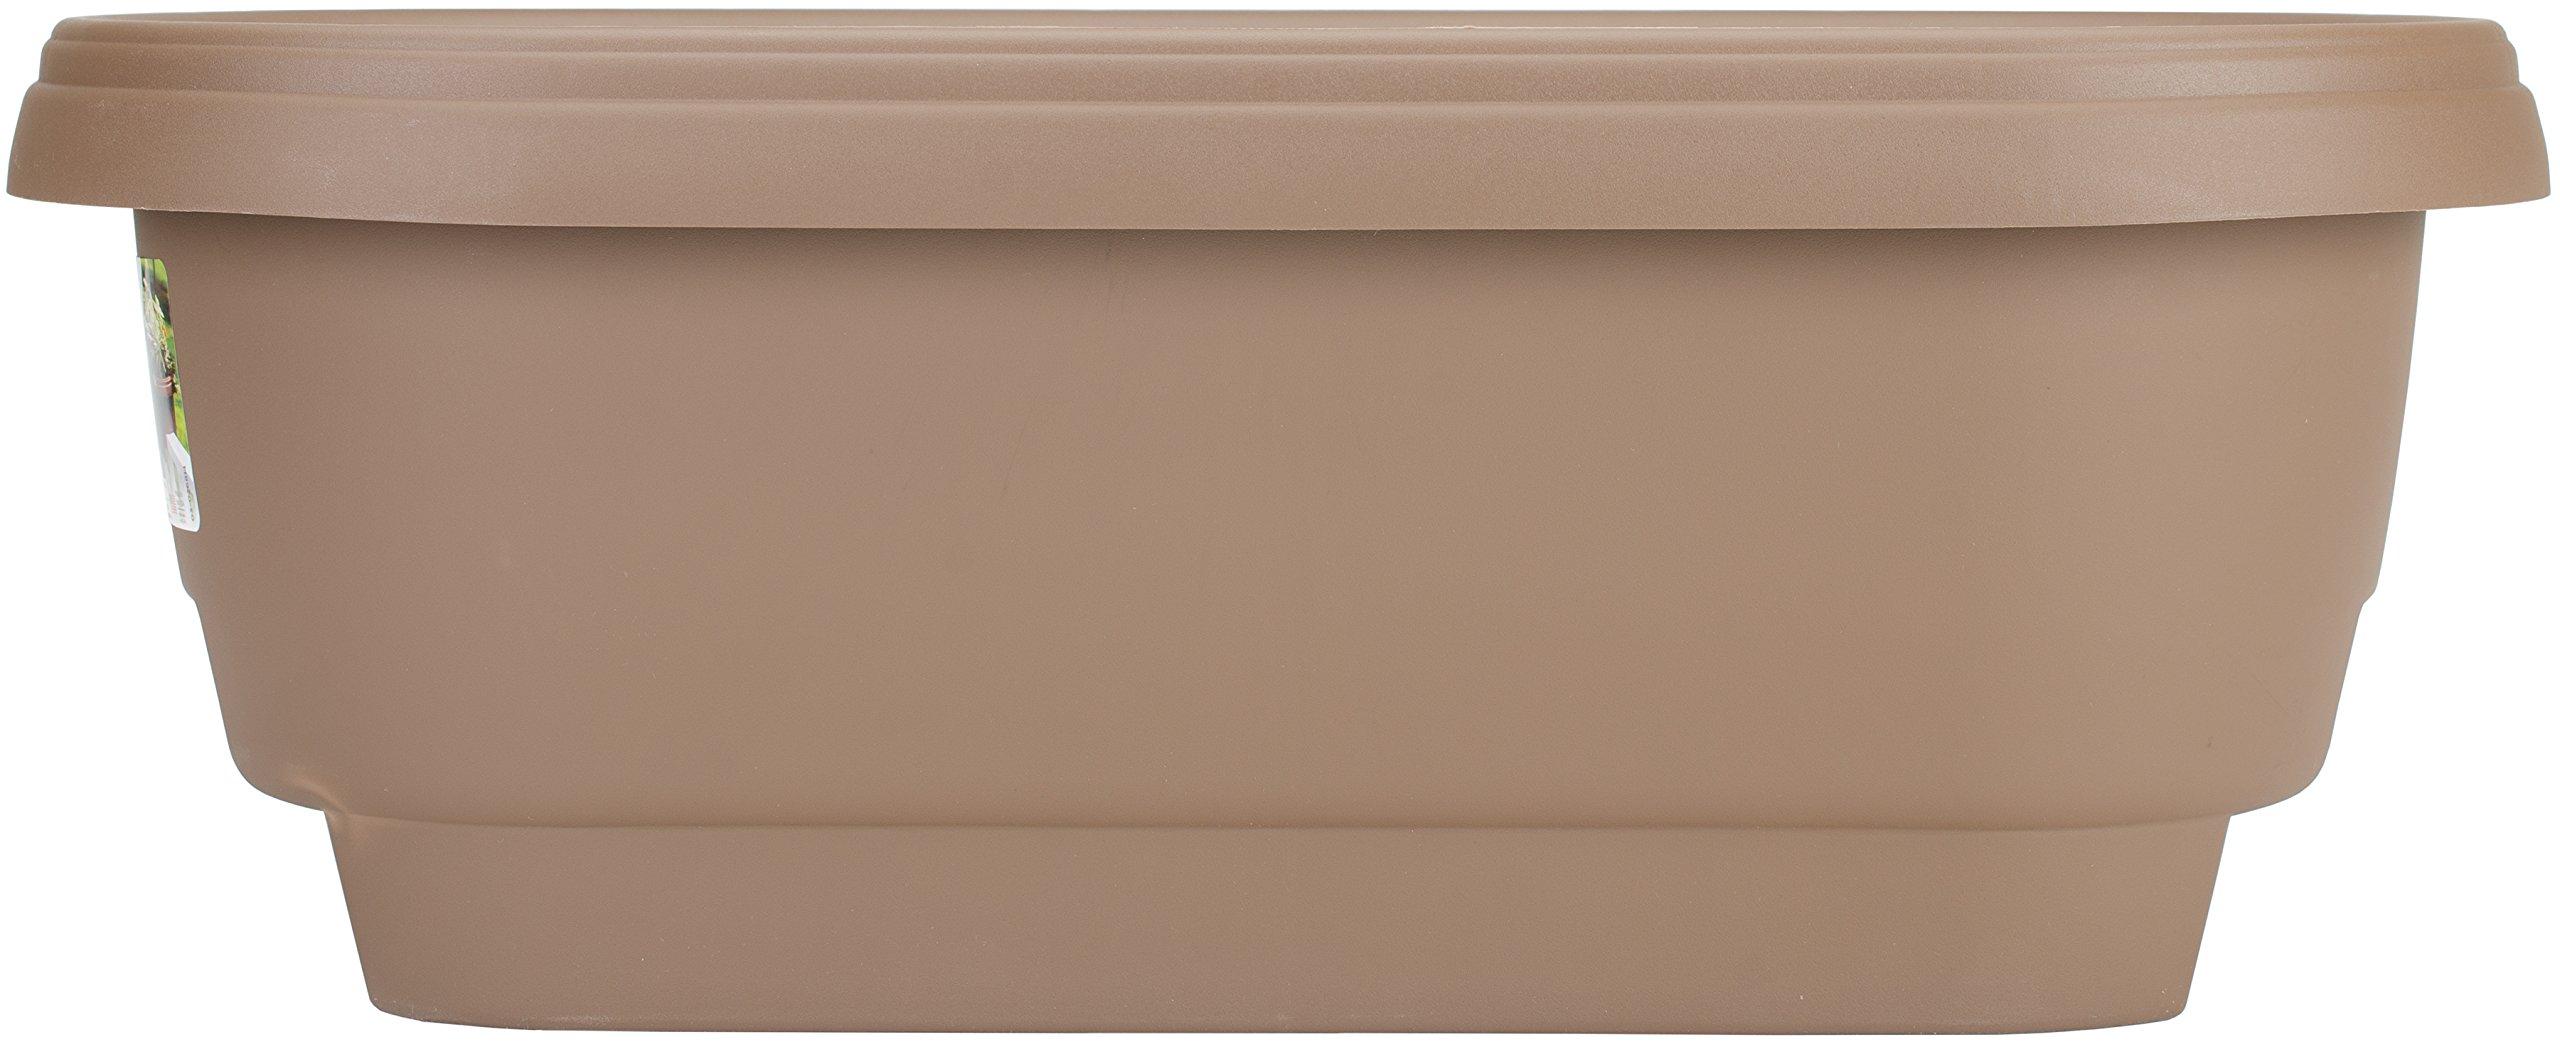 Bloem Deck Balcony Rail Planter 24'' Chocolate by Bloem (Image #1)